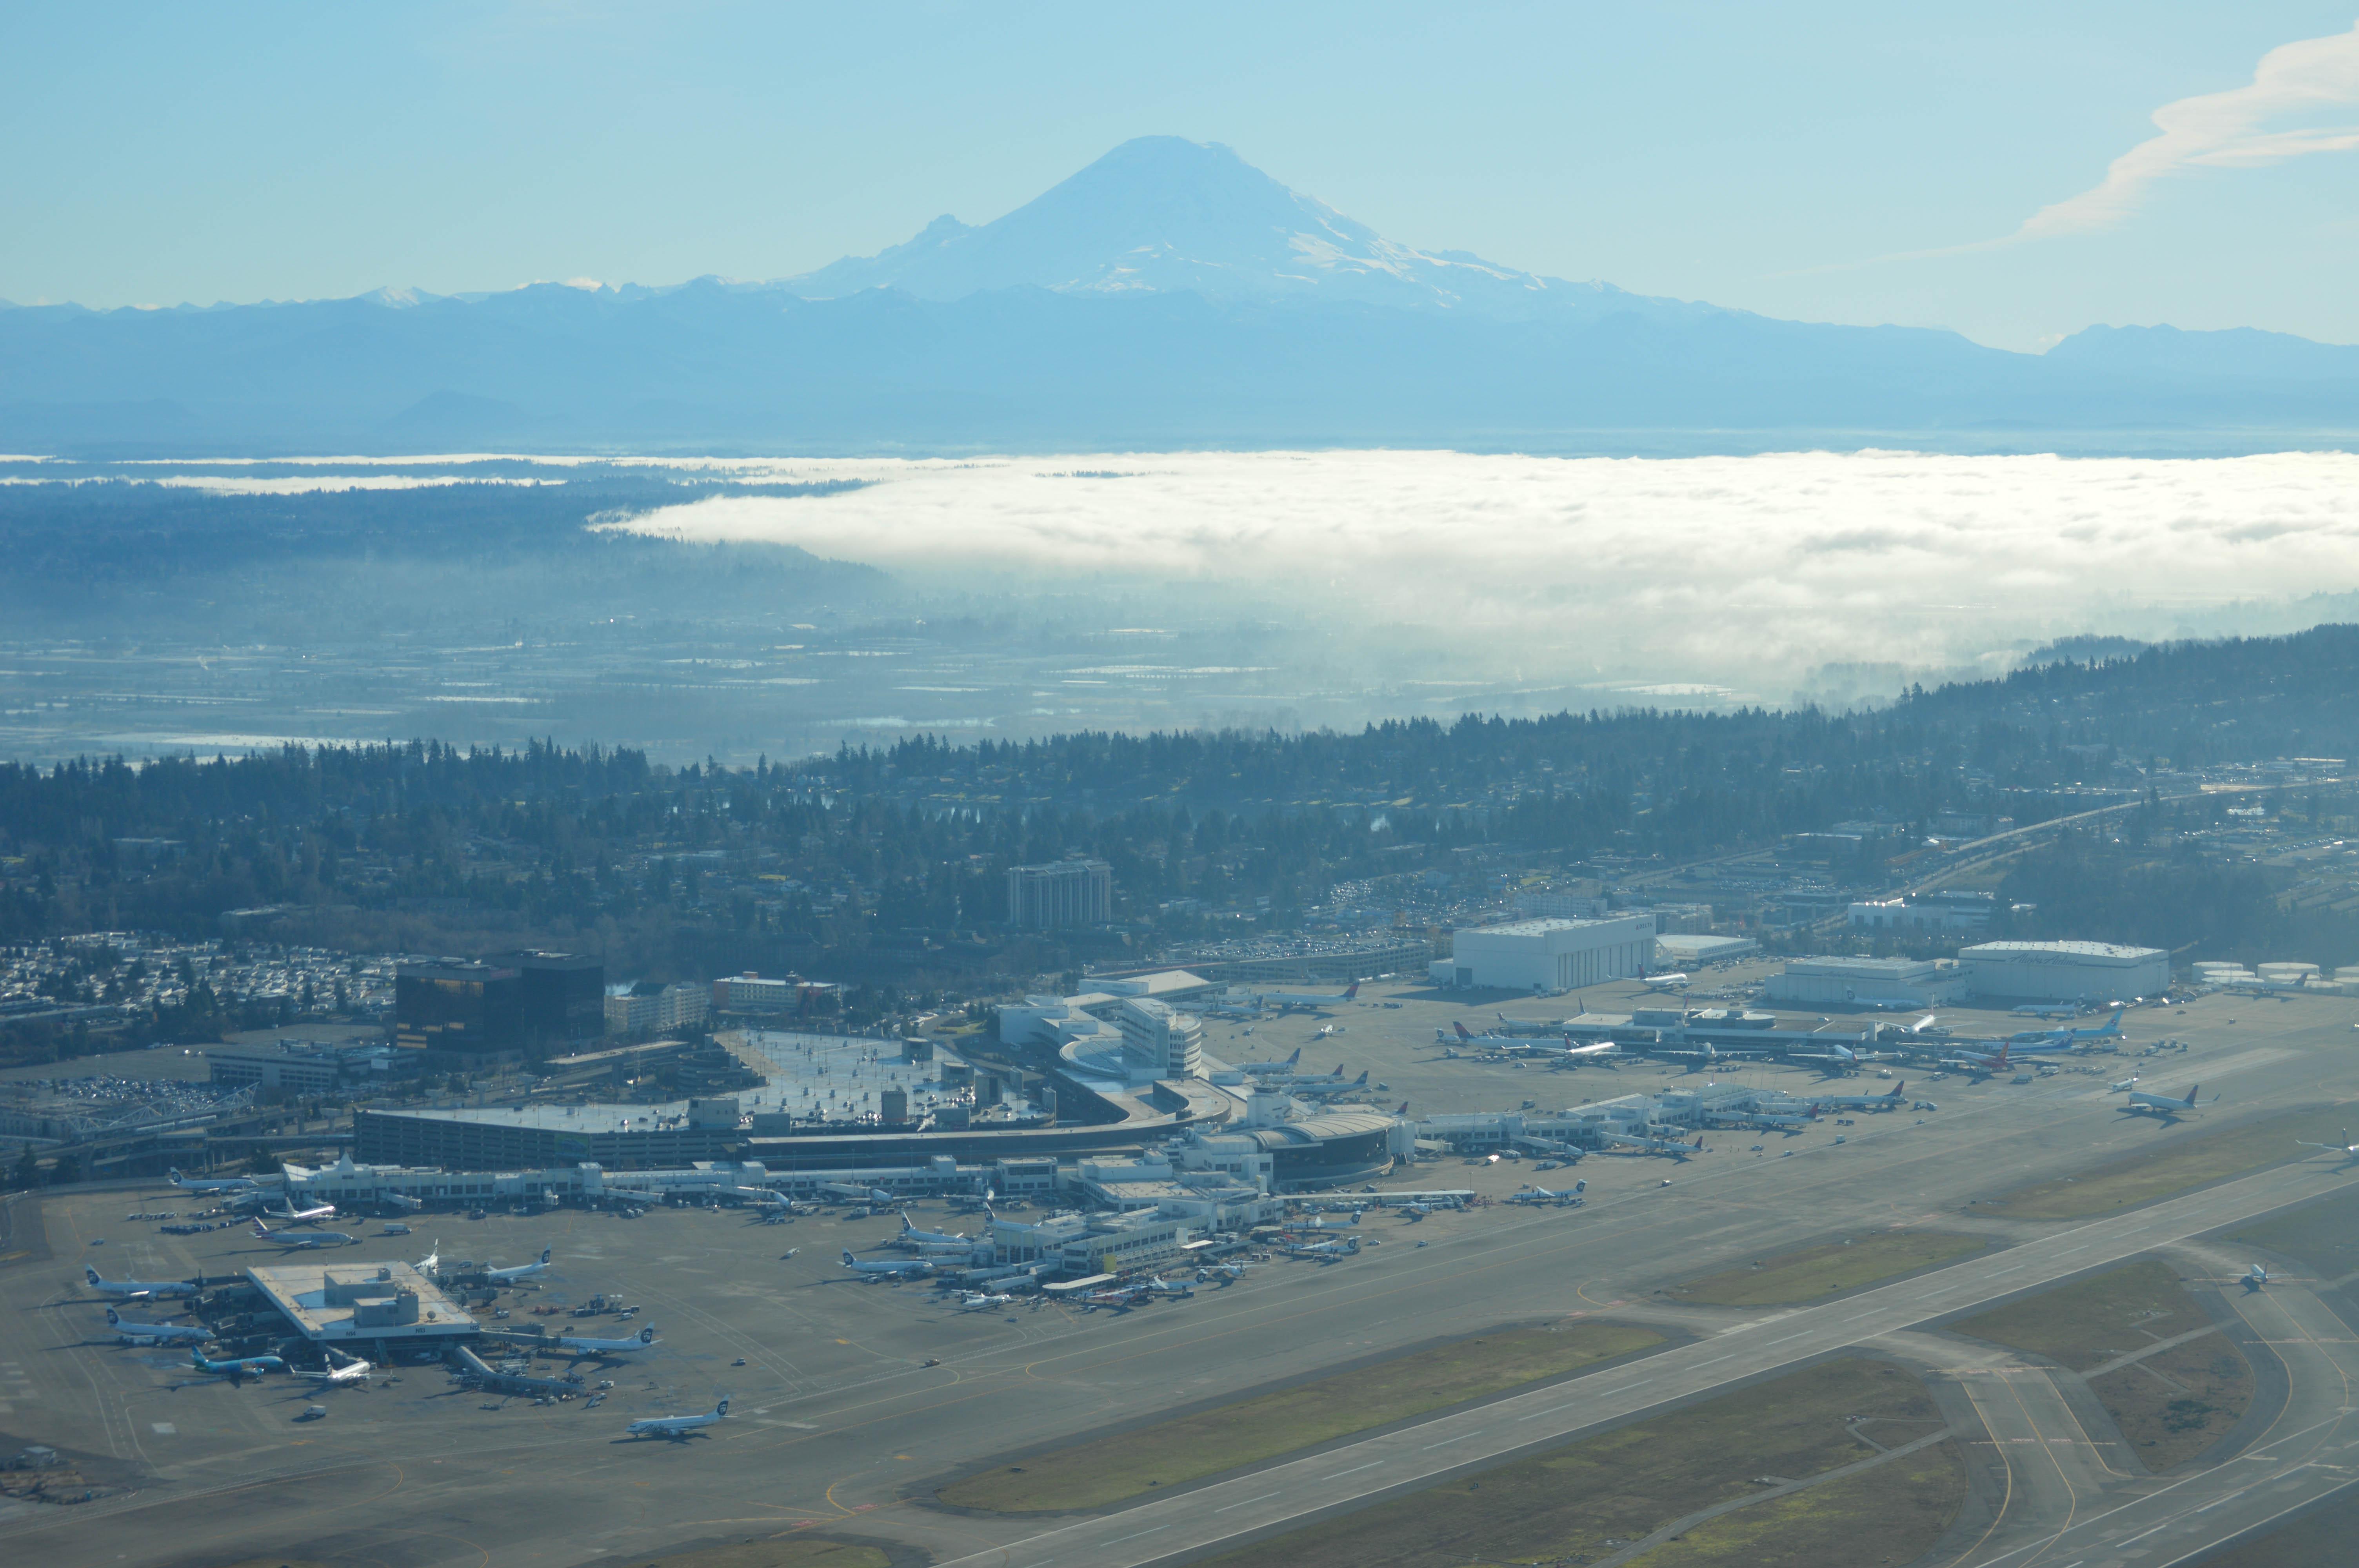 Seattle-Tacoma International Airport. Foto: Bernstea